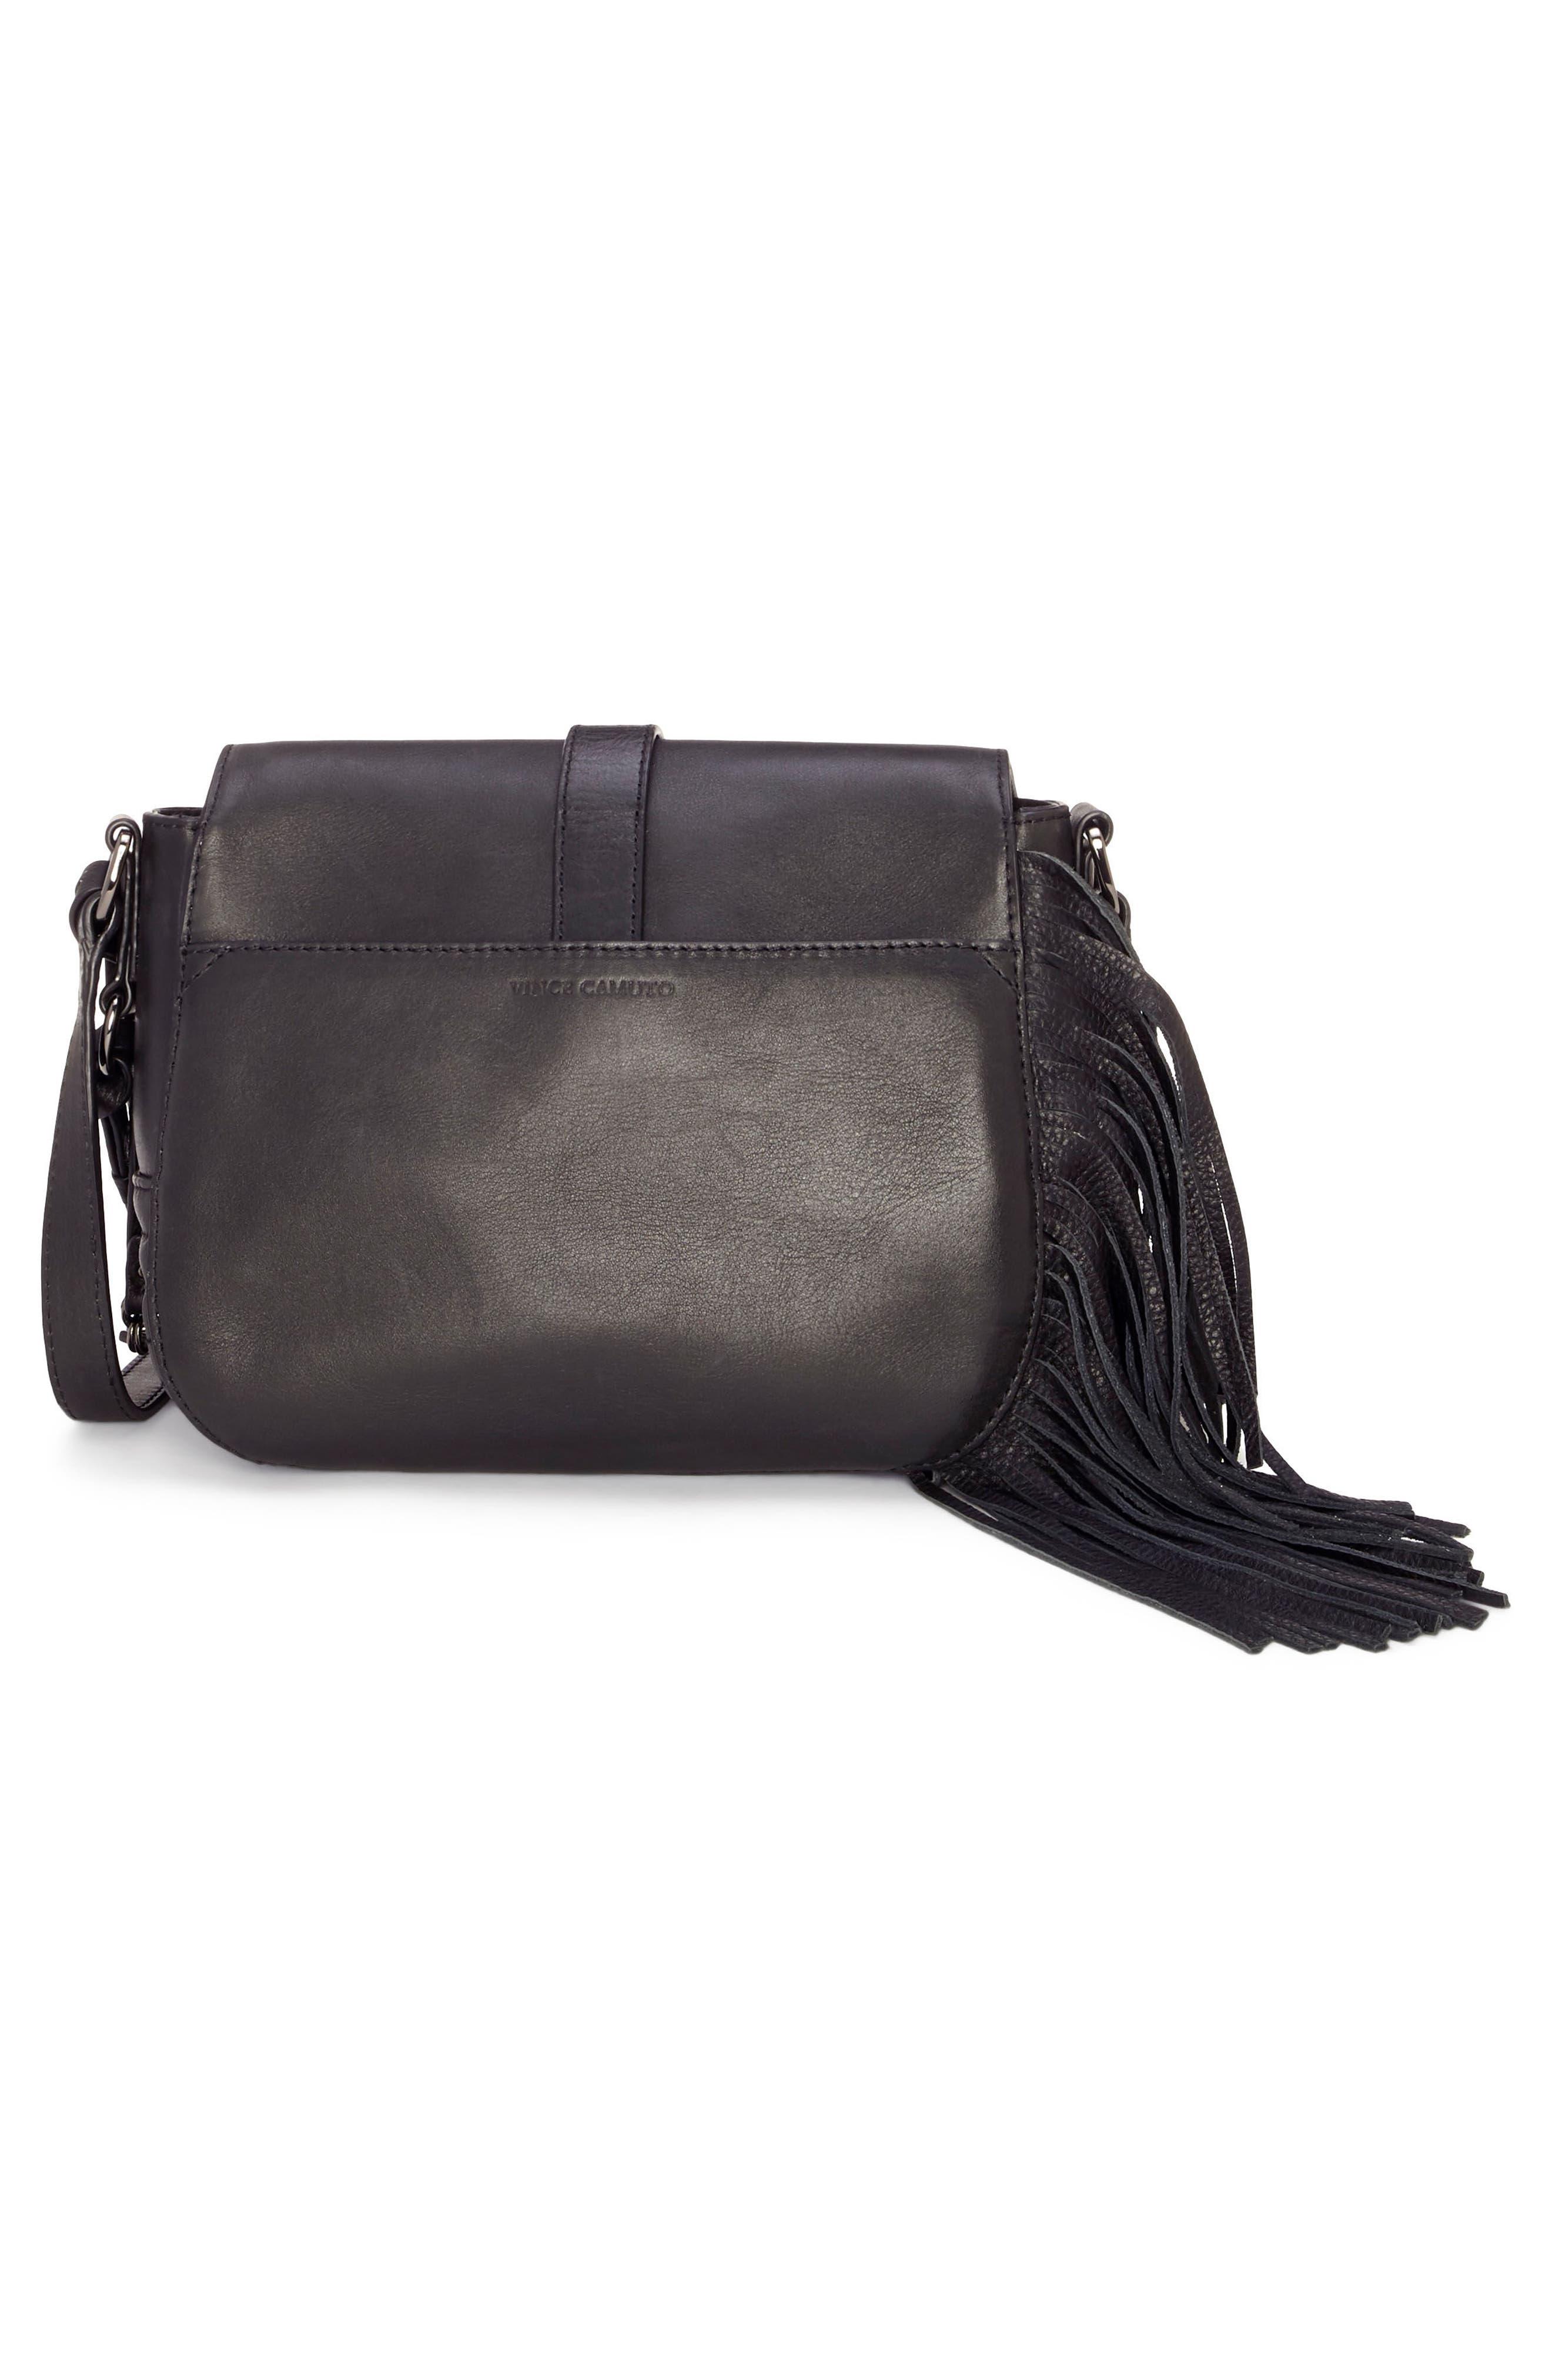 Hil Leather Crossbody Bag,                             Alternate thumbnail 2, color,                             002